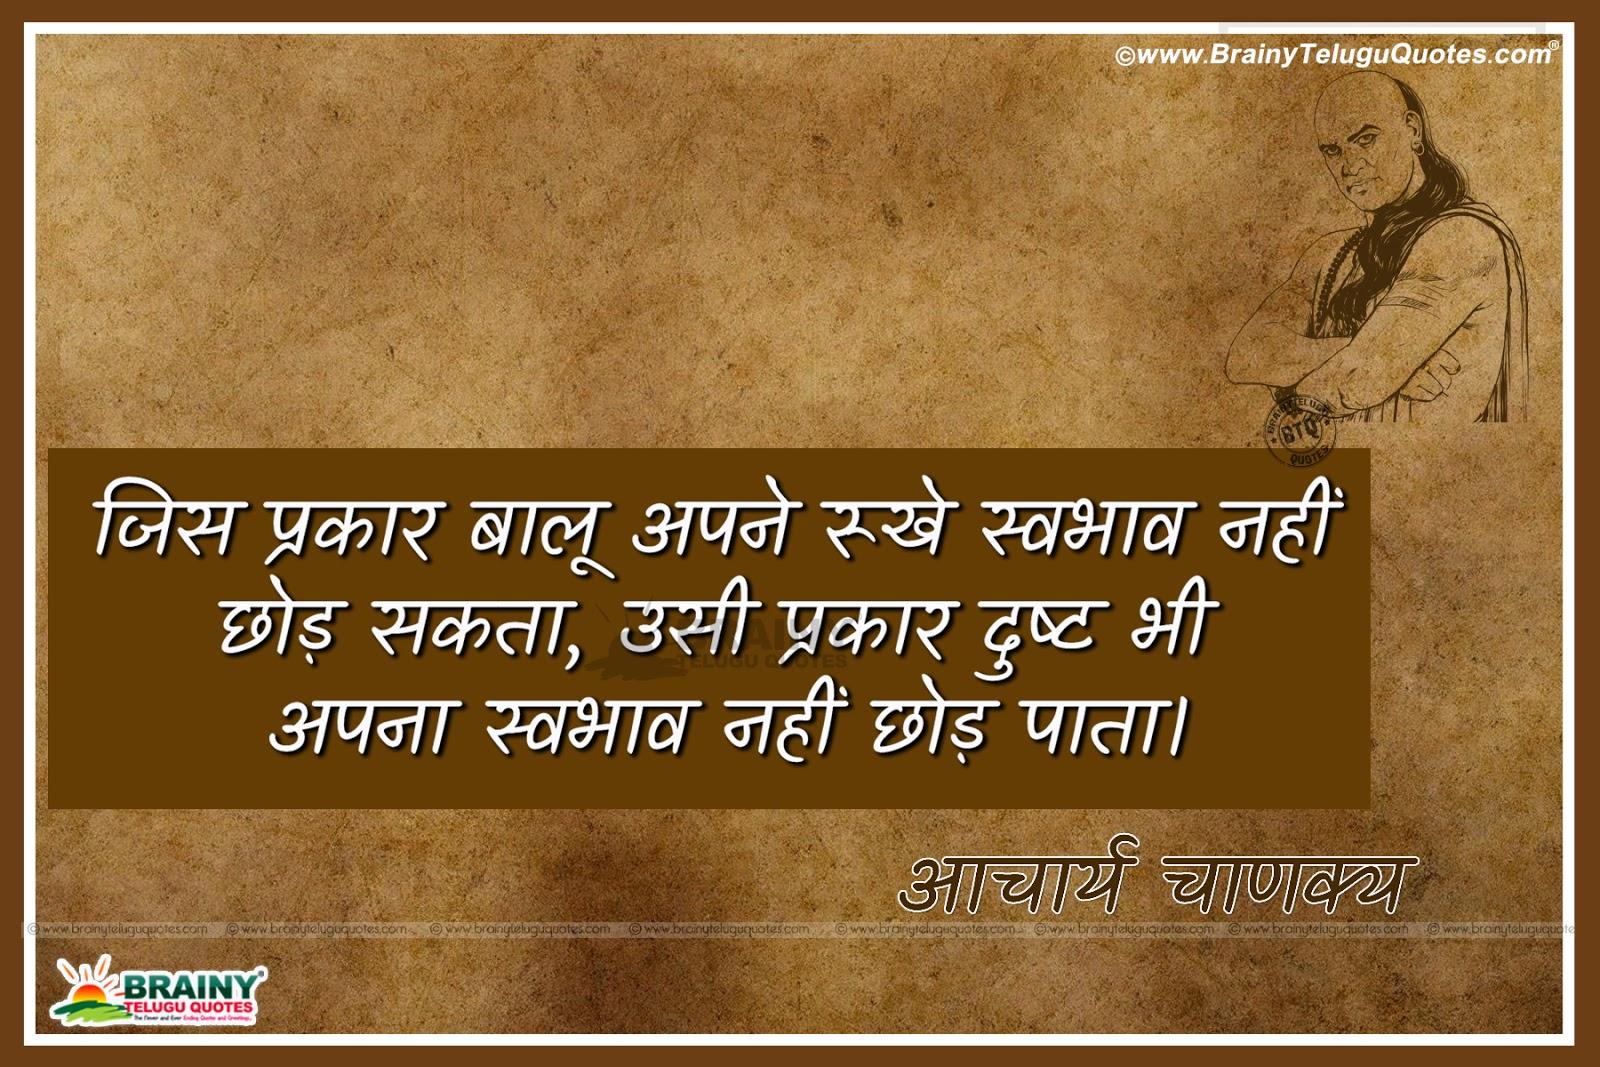 Chanakya Anmol Vachan in Hindi Font-Best Inspirational